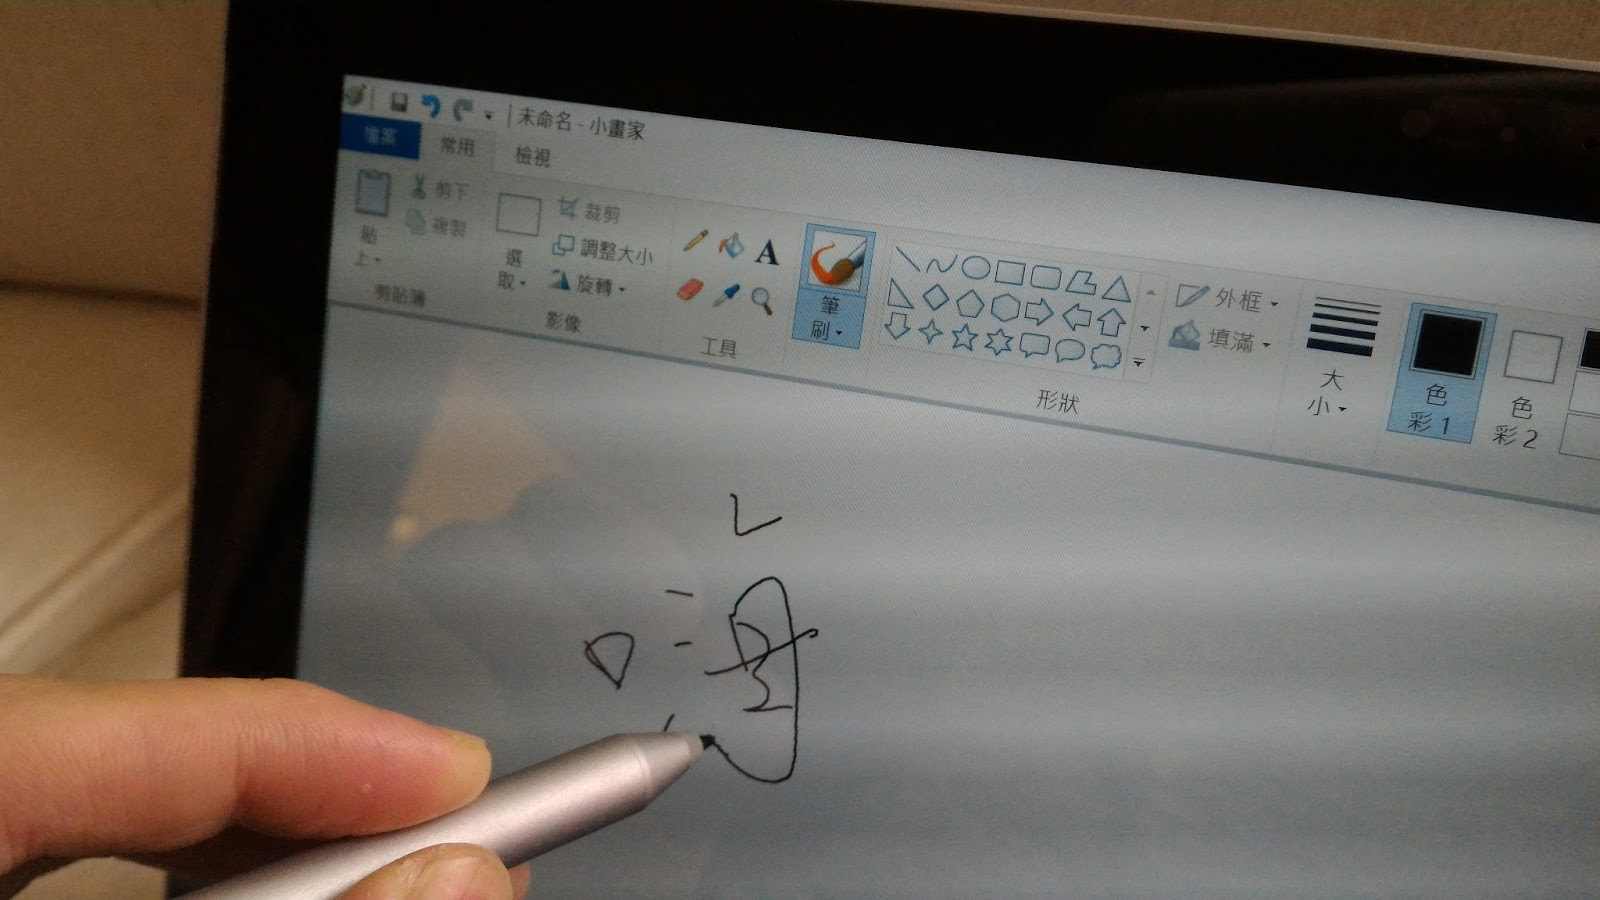 P 20170122 163328 - [開箱] 效能輕薄兼具.Surface Pro 3 (i3/64G) 使用心得!